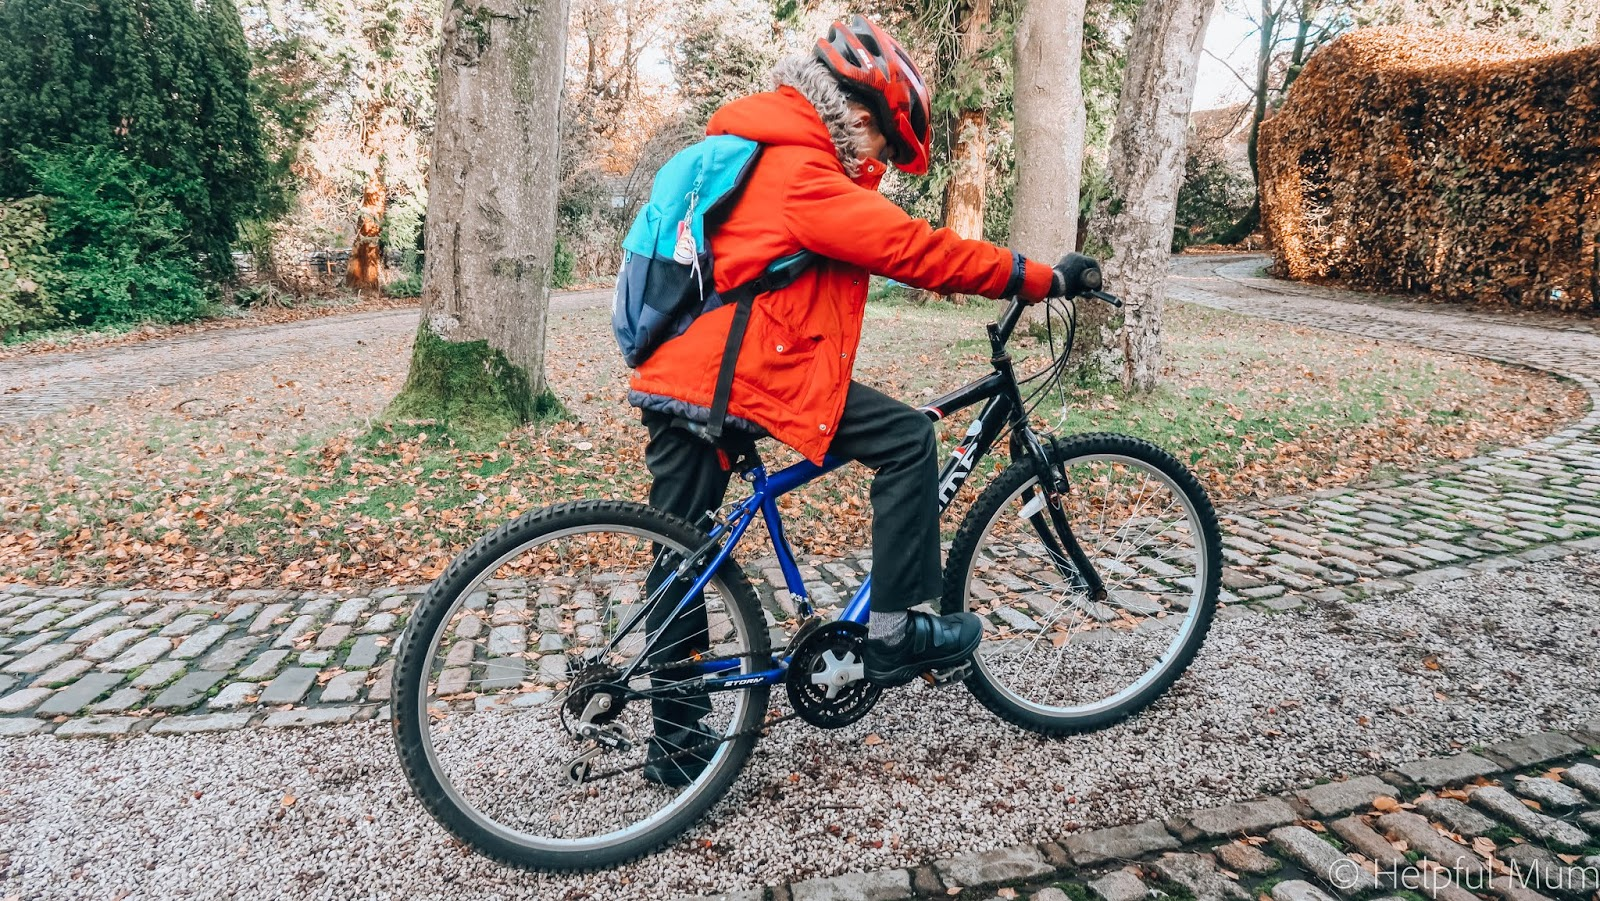 Riding bike to school